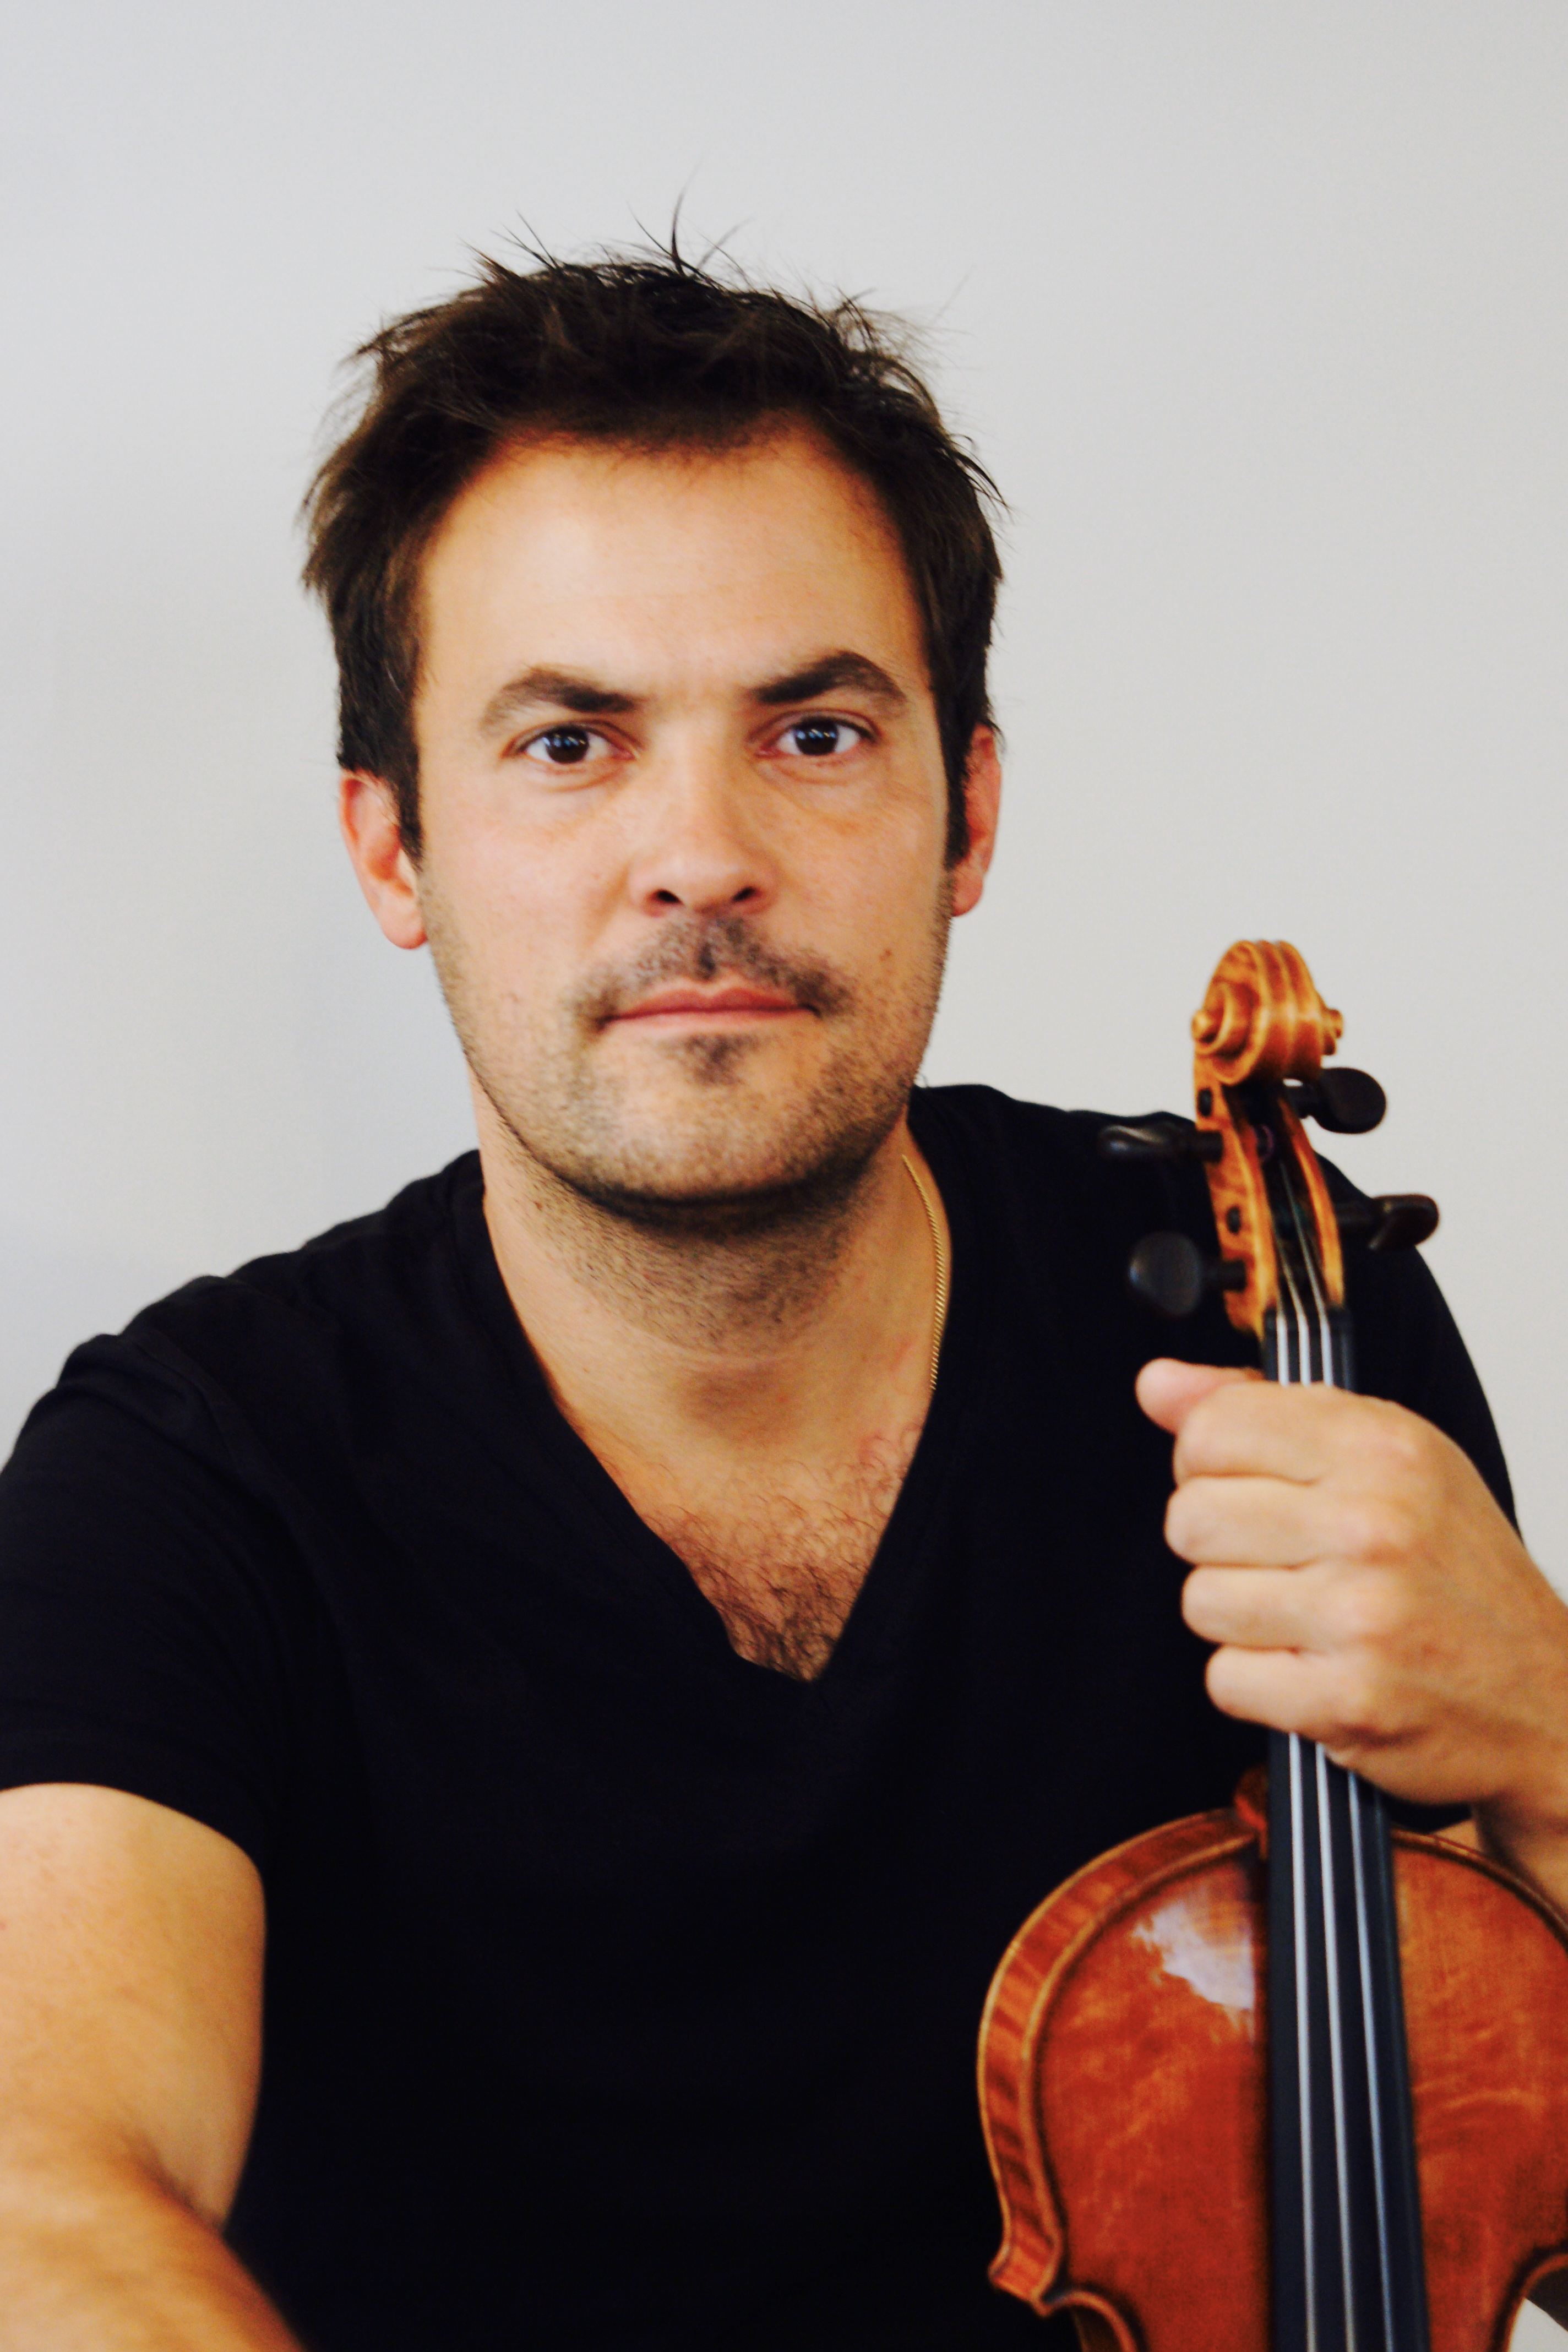 Yvo Wettstein